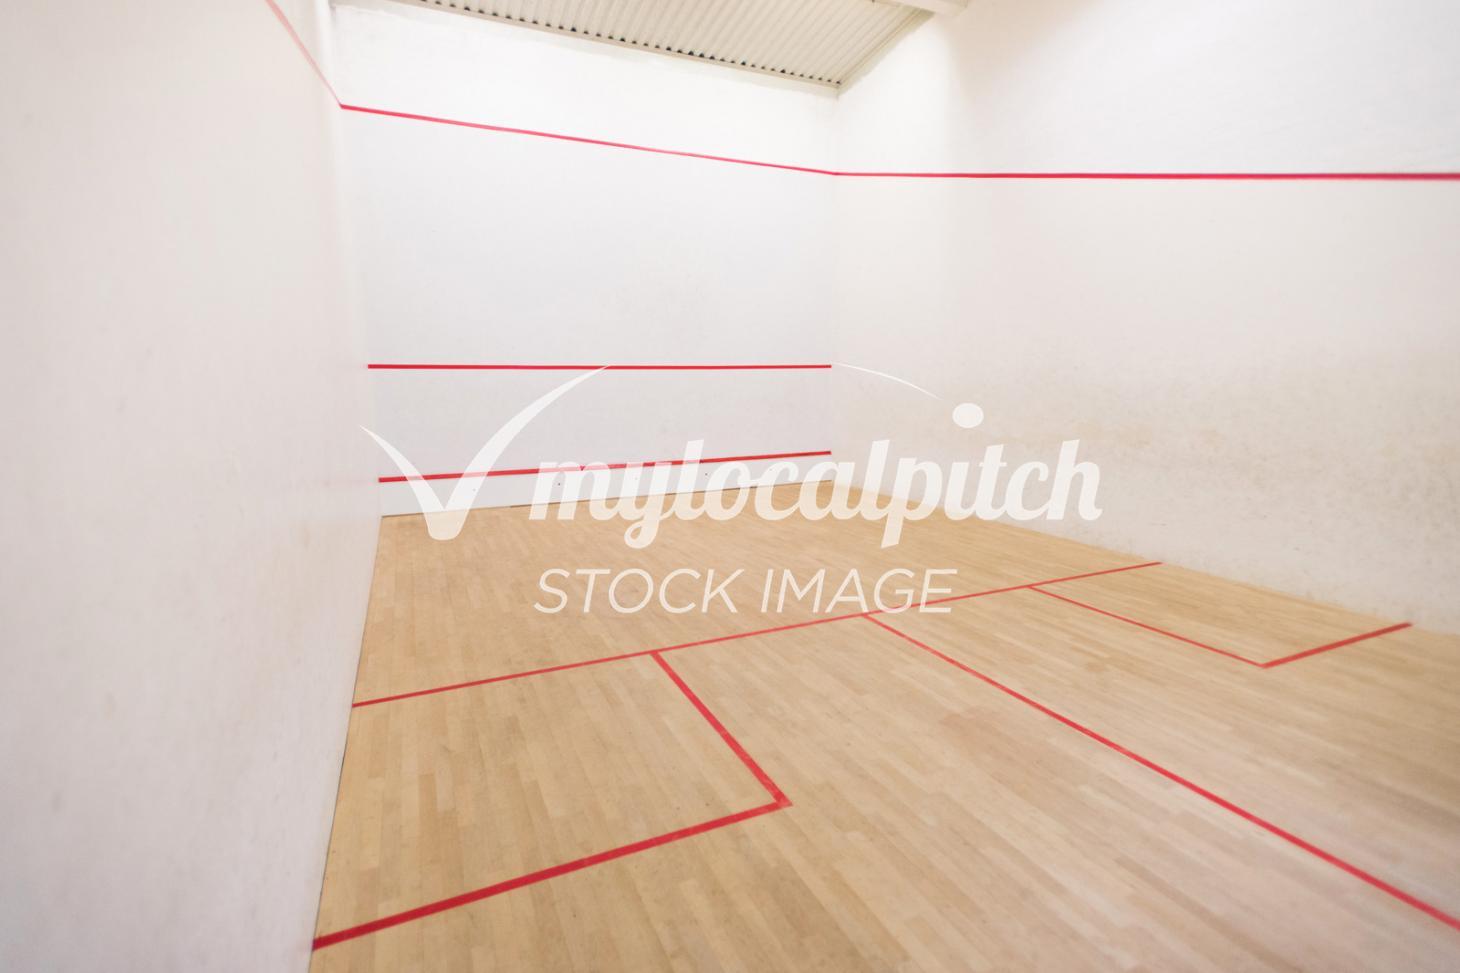 Dolphin Fitness Club Indoor | Hard squash court